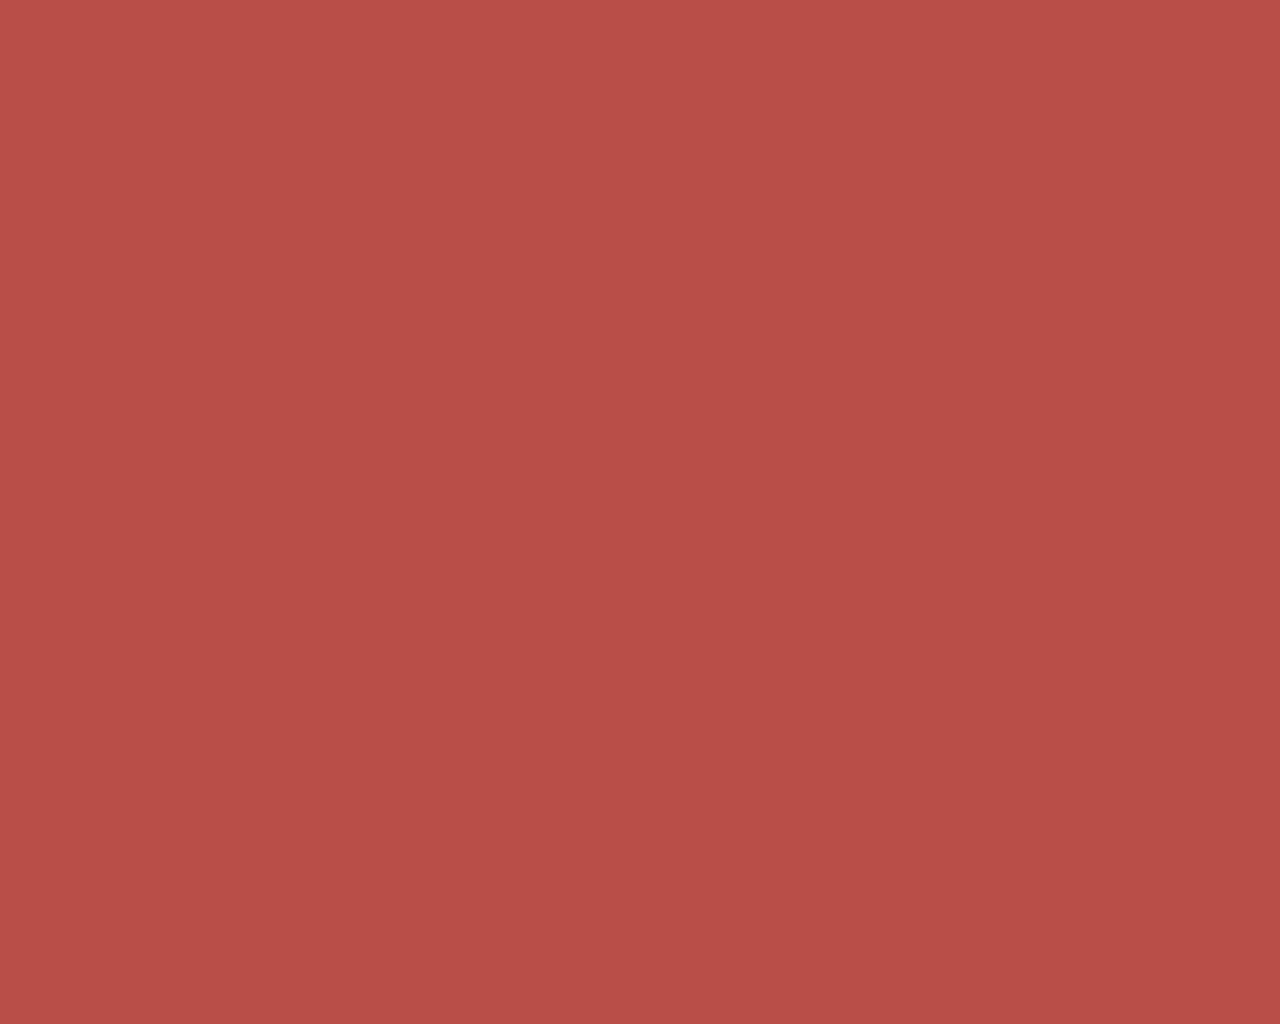 1280x1024 Deep Chestnut Solid Color Background